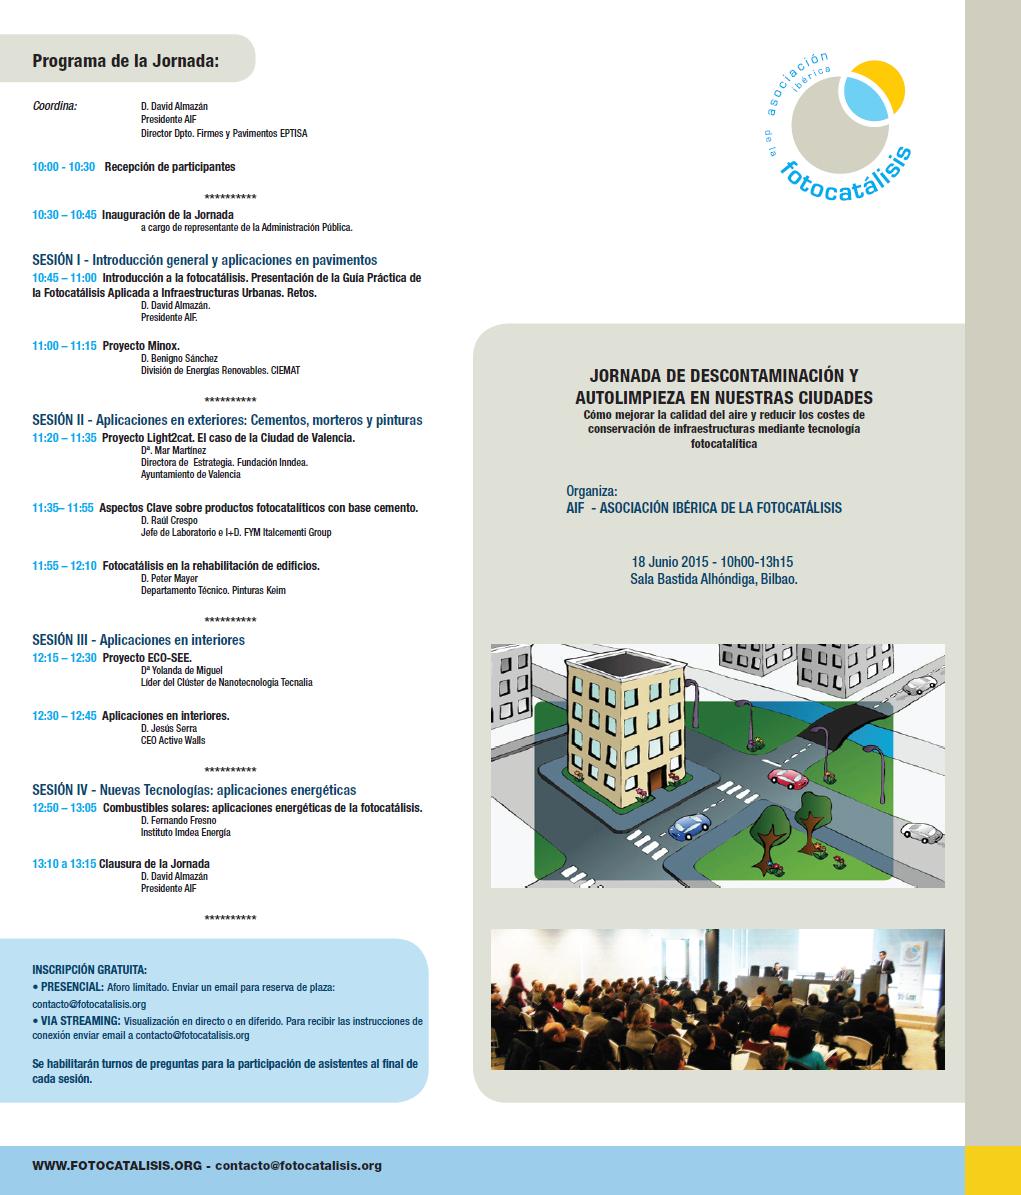 Imagen-Programa